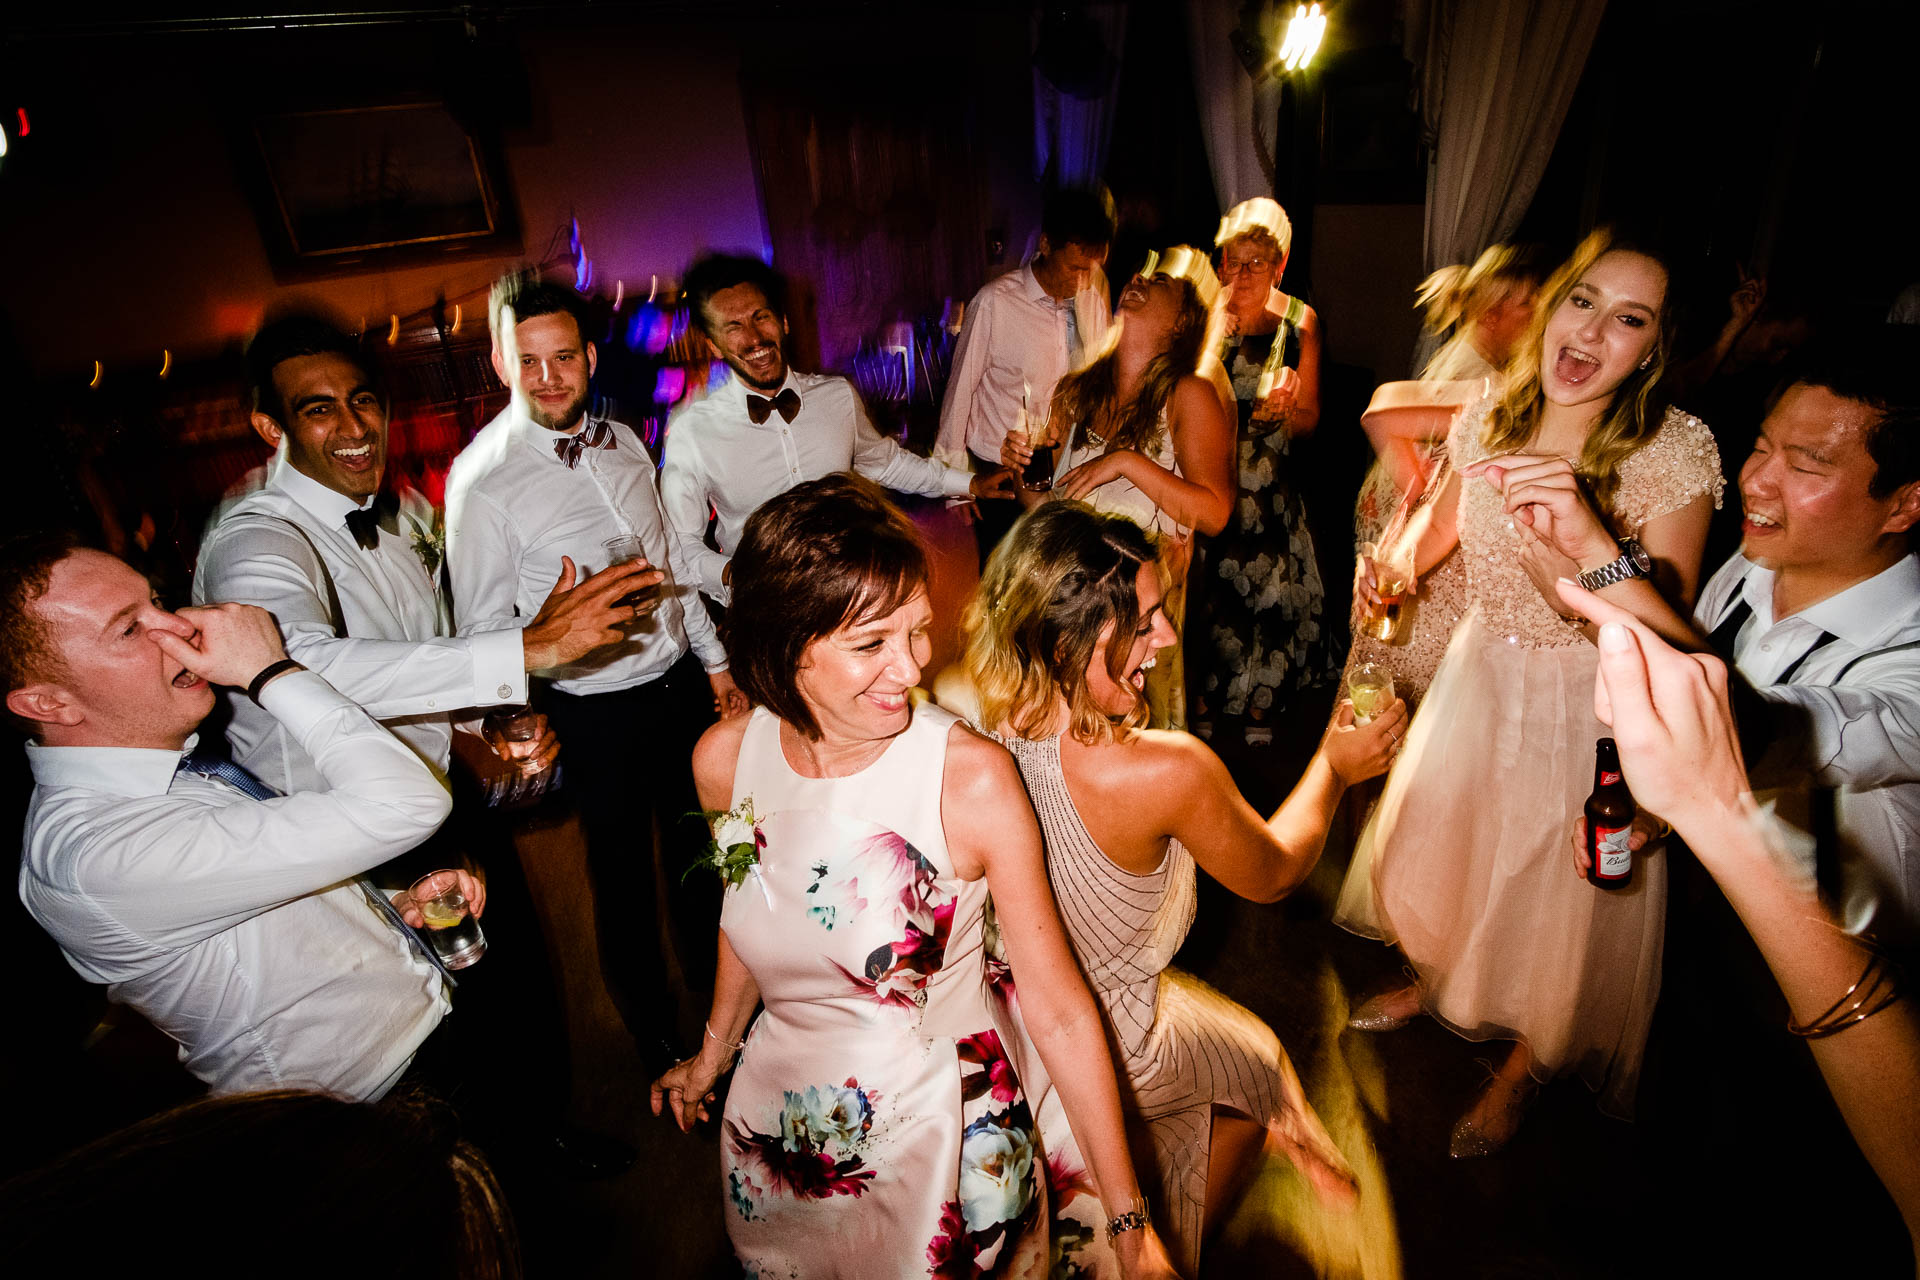 orchardleigh house wedding - Danni & Barney (540).jpg